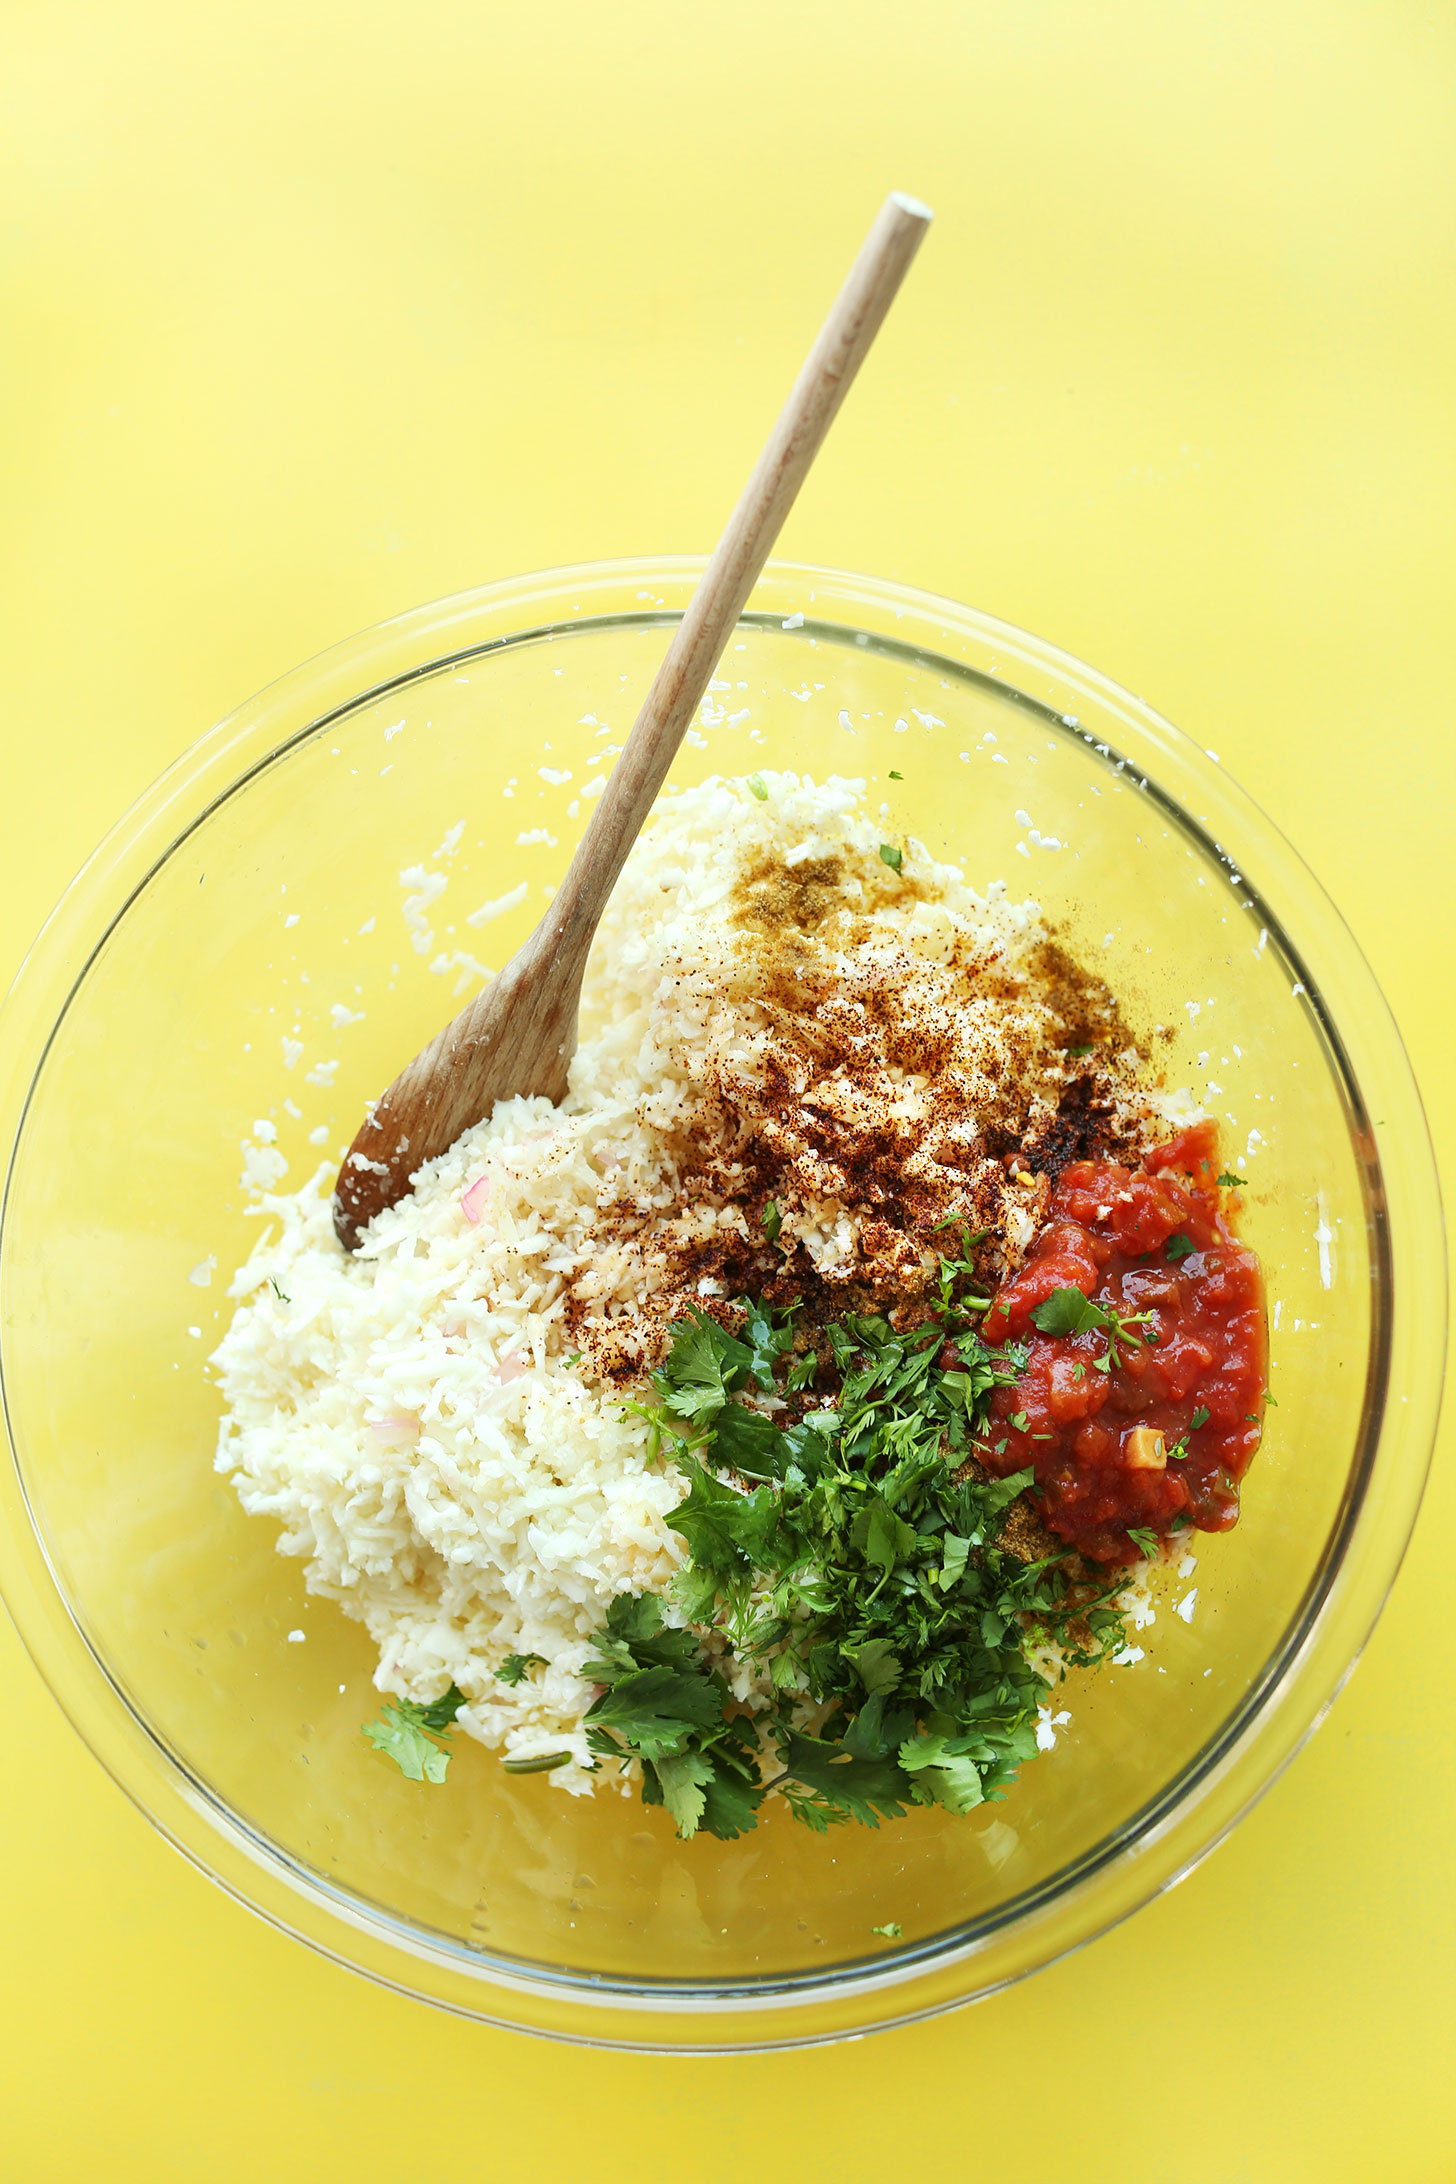 Stirring together cauliflower rice and seasonings for healthy Cauliflower Rice Burrito Bowls